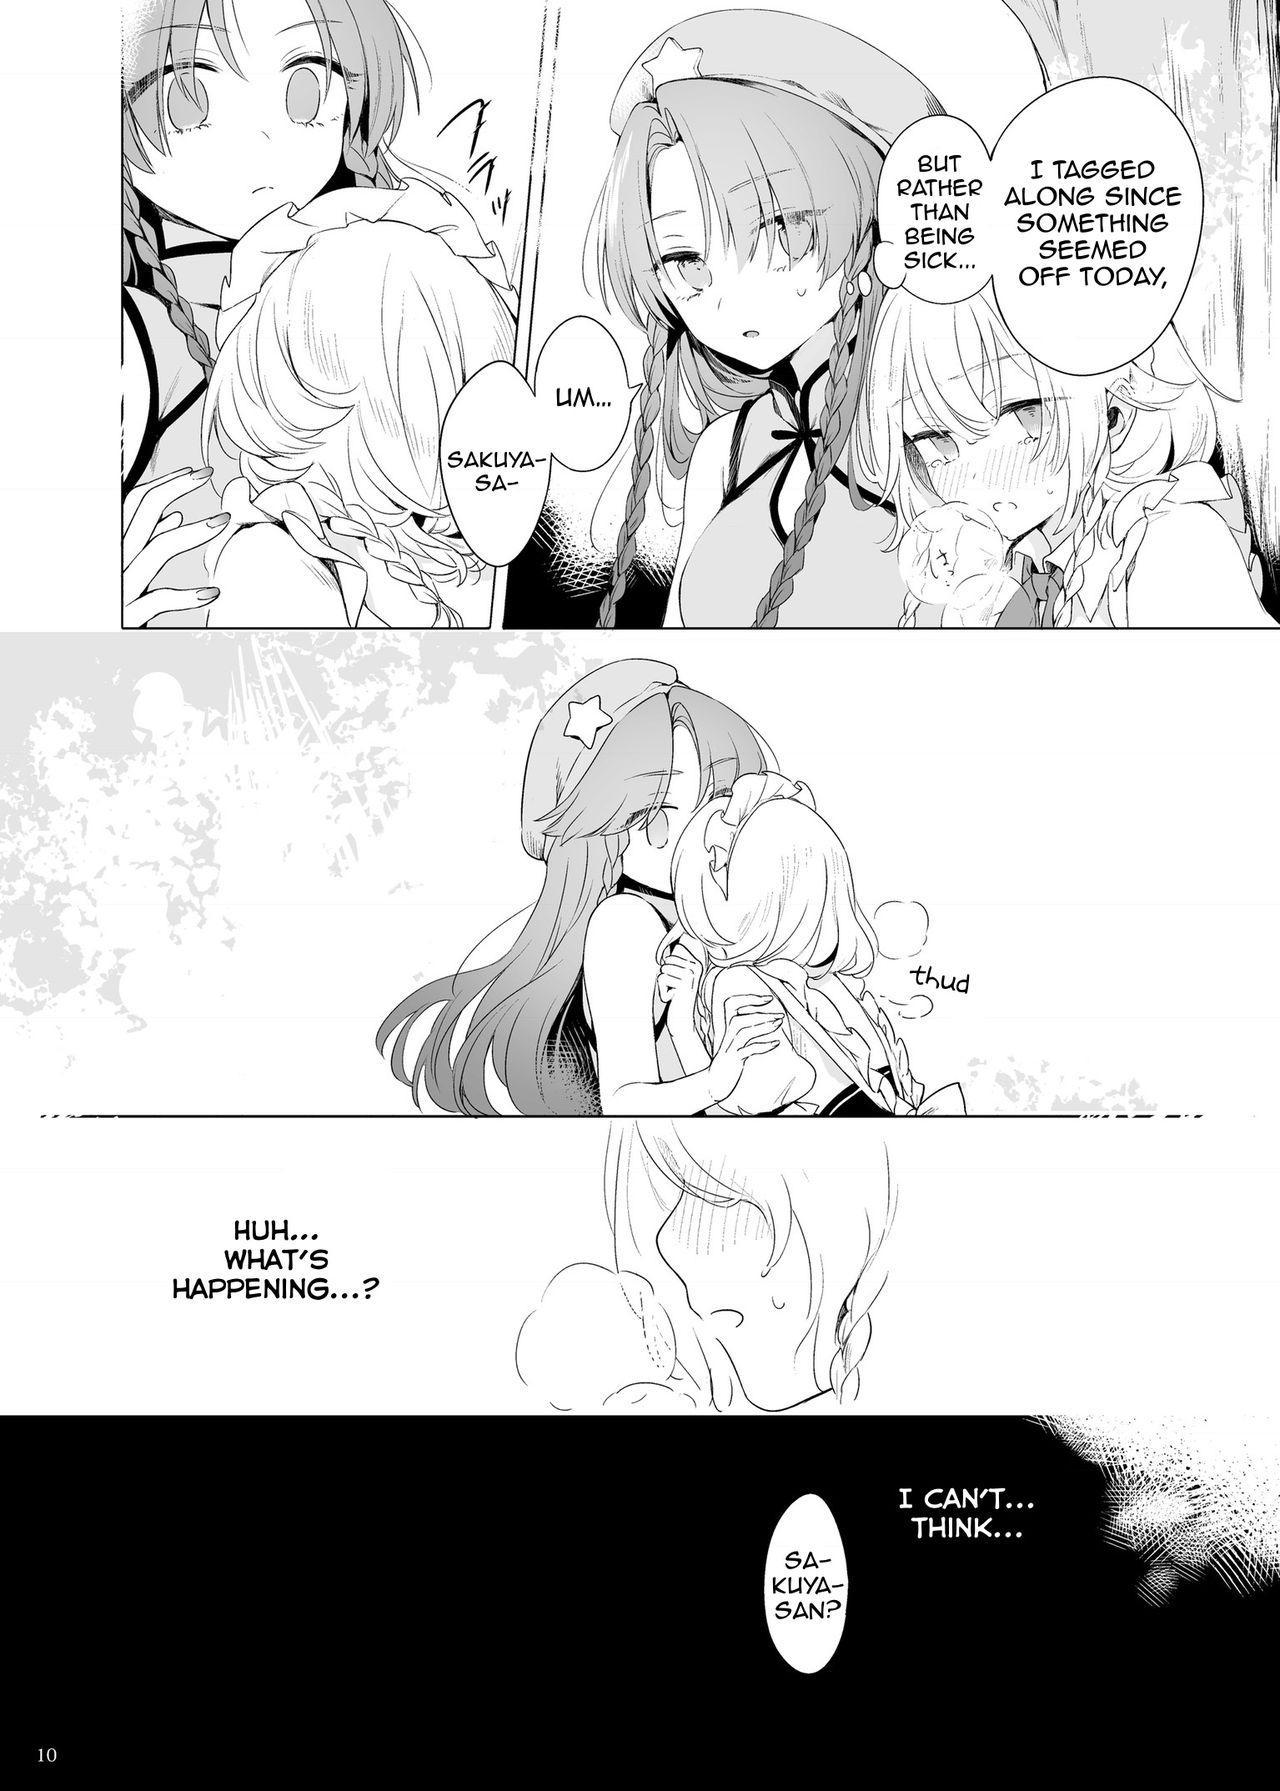 Meiling ni Kawaigarareru Sakuya-san ga Mitai Hon   A book about Sakuya getting sweet with Meiling 9